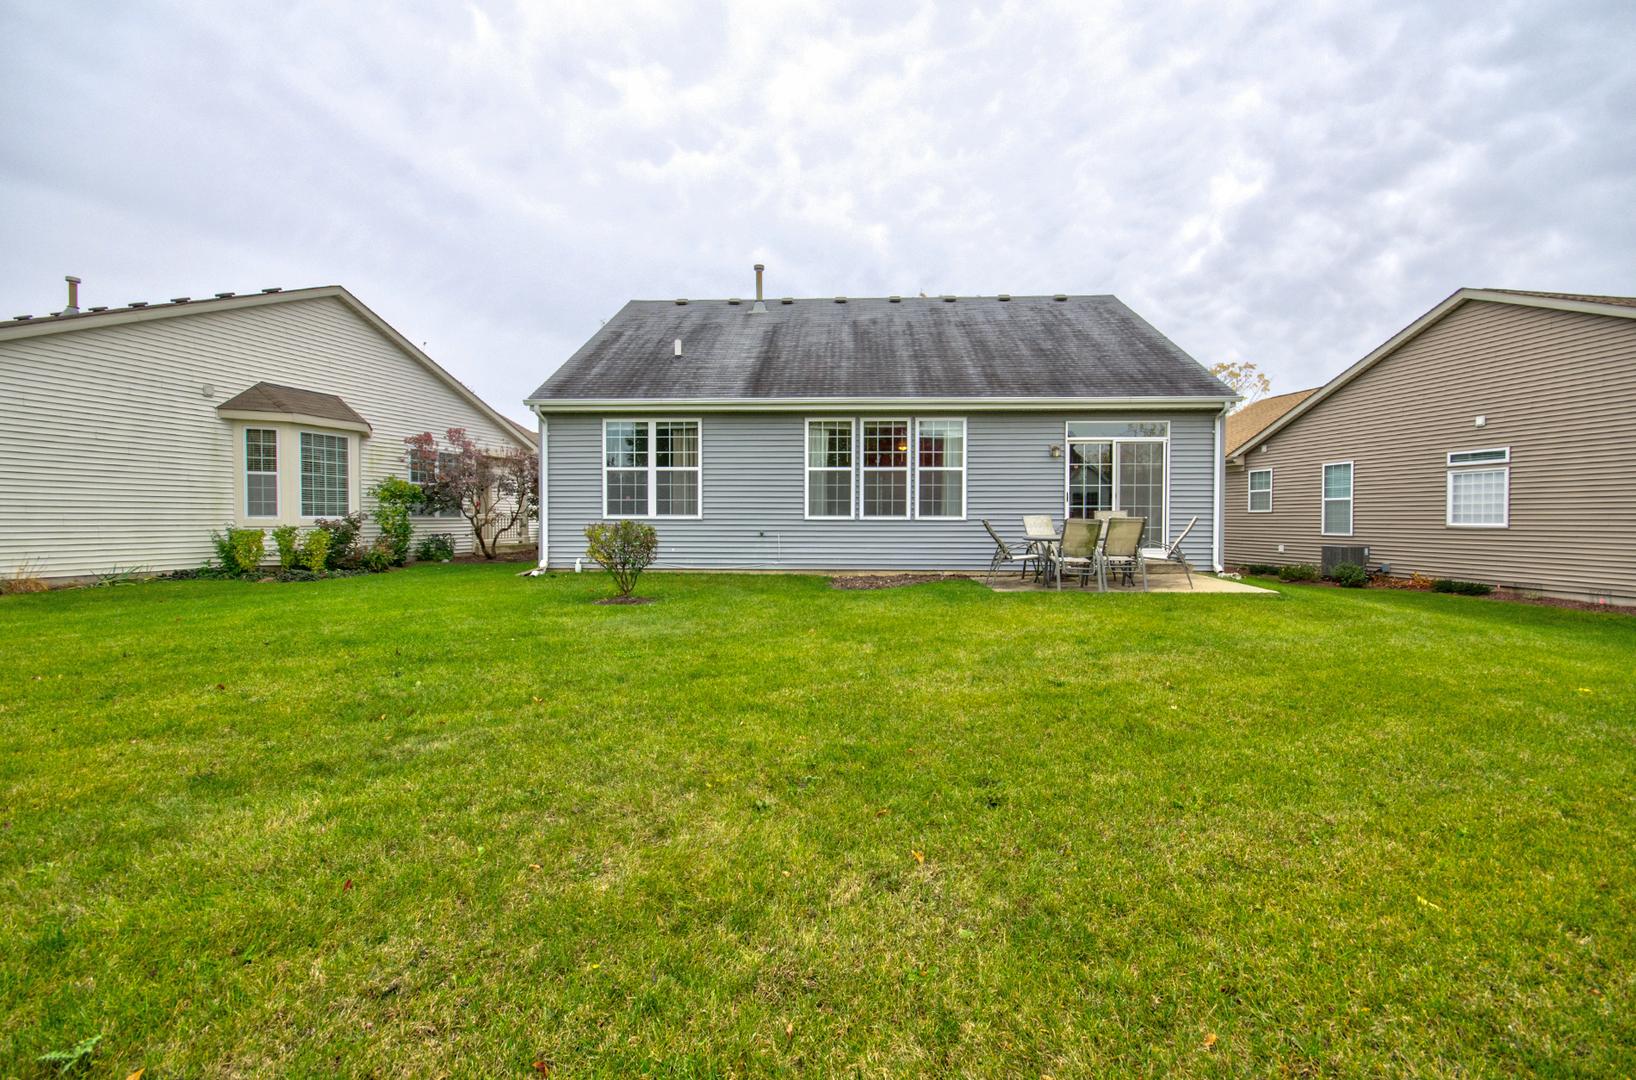 21308 Brush Lake, Crest Hill, Illinois, 60403